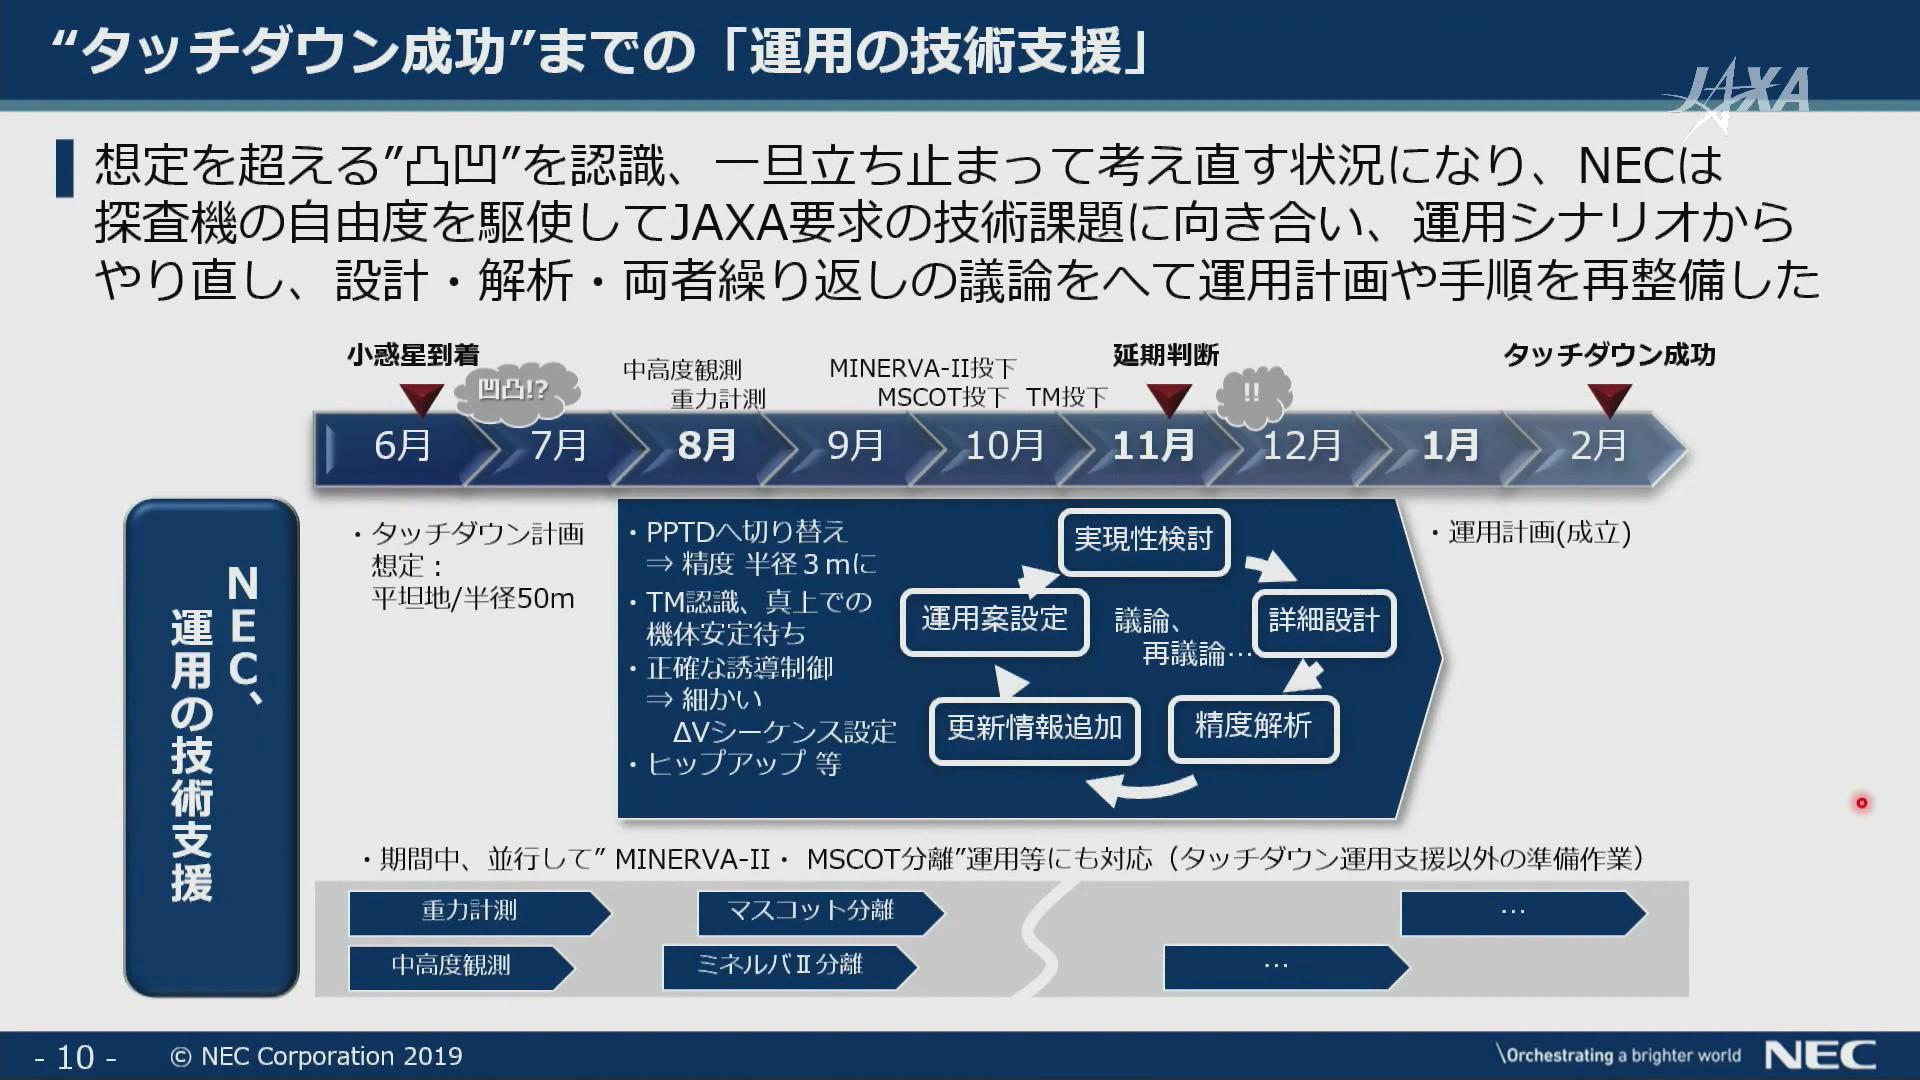 f:id:Imamura:20191219211843p:plain